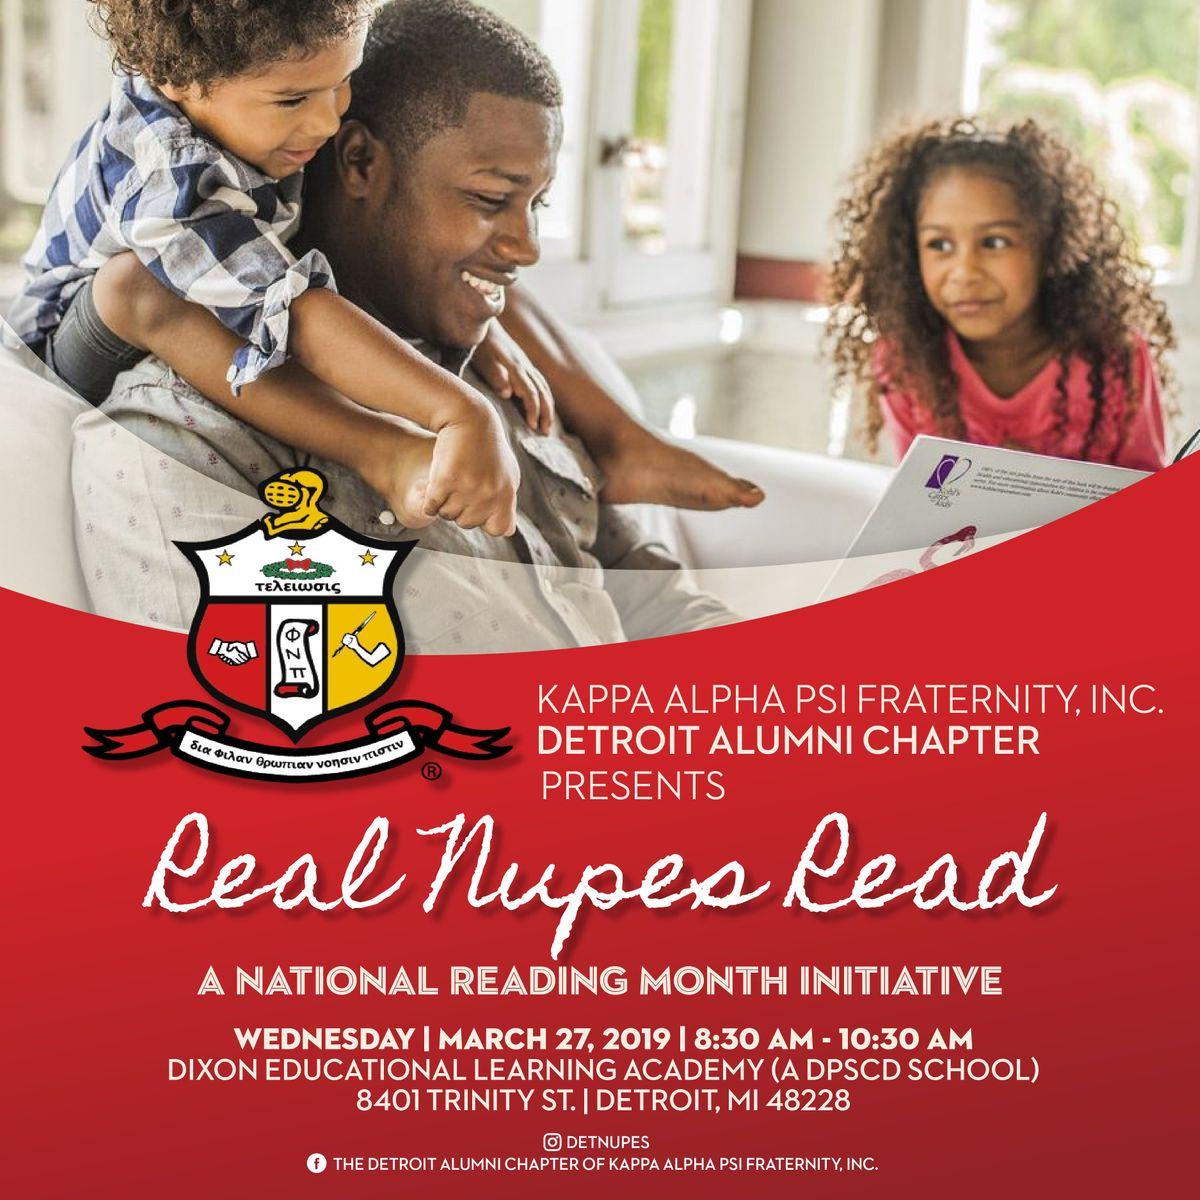 Kappa Alpha Psi Fraternity Inc. Presents Real Nupes Read